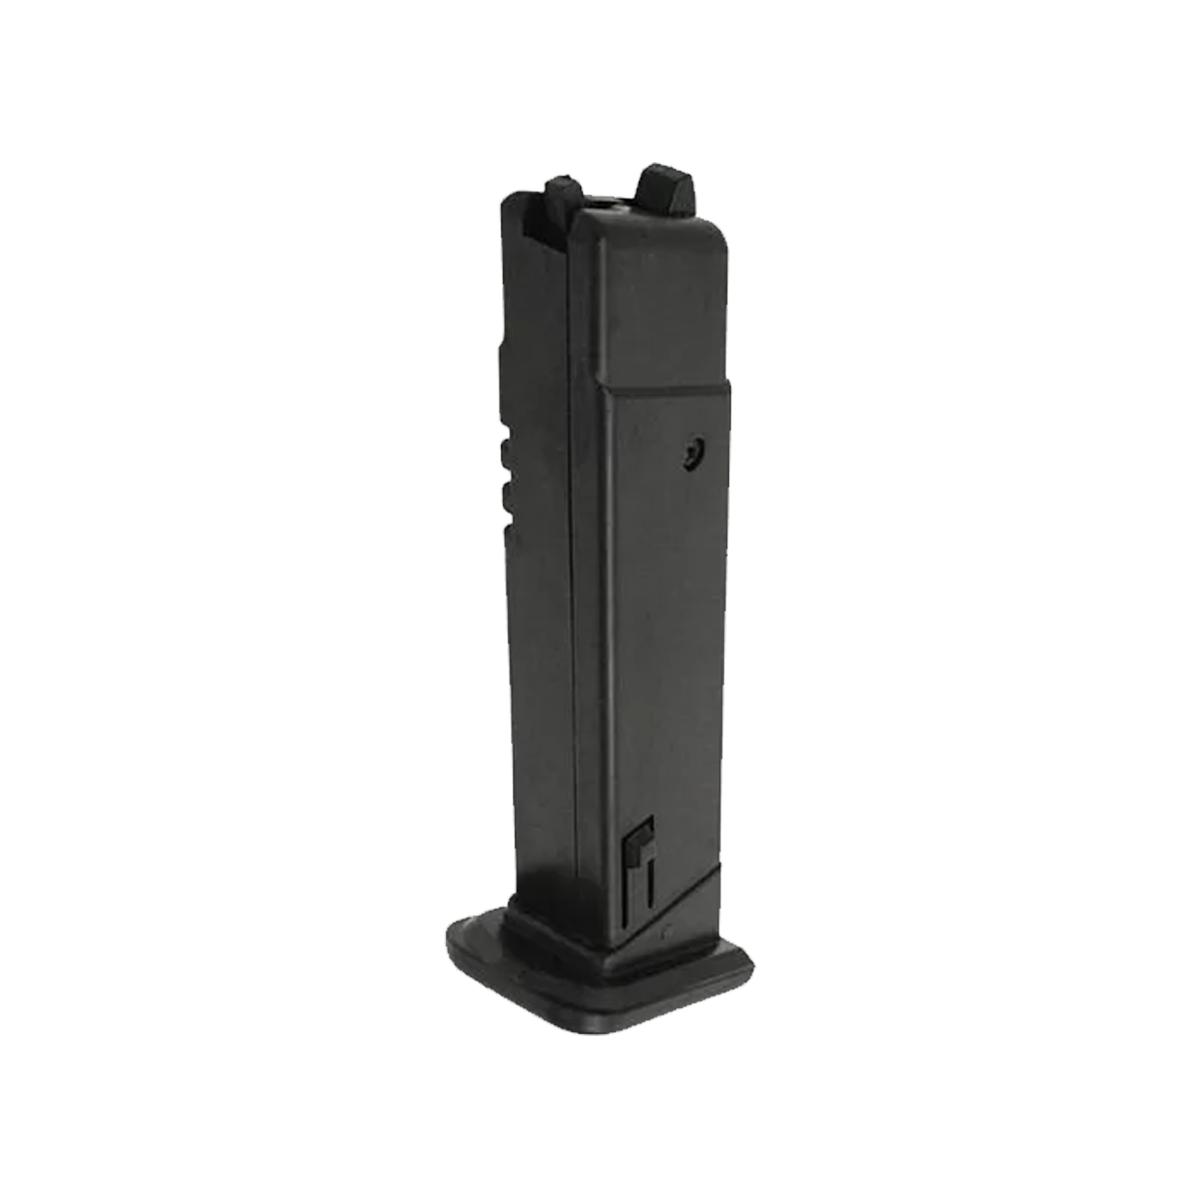 Pistola Airsoft Glock G7 Kwc Spring Gun 6mm